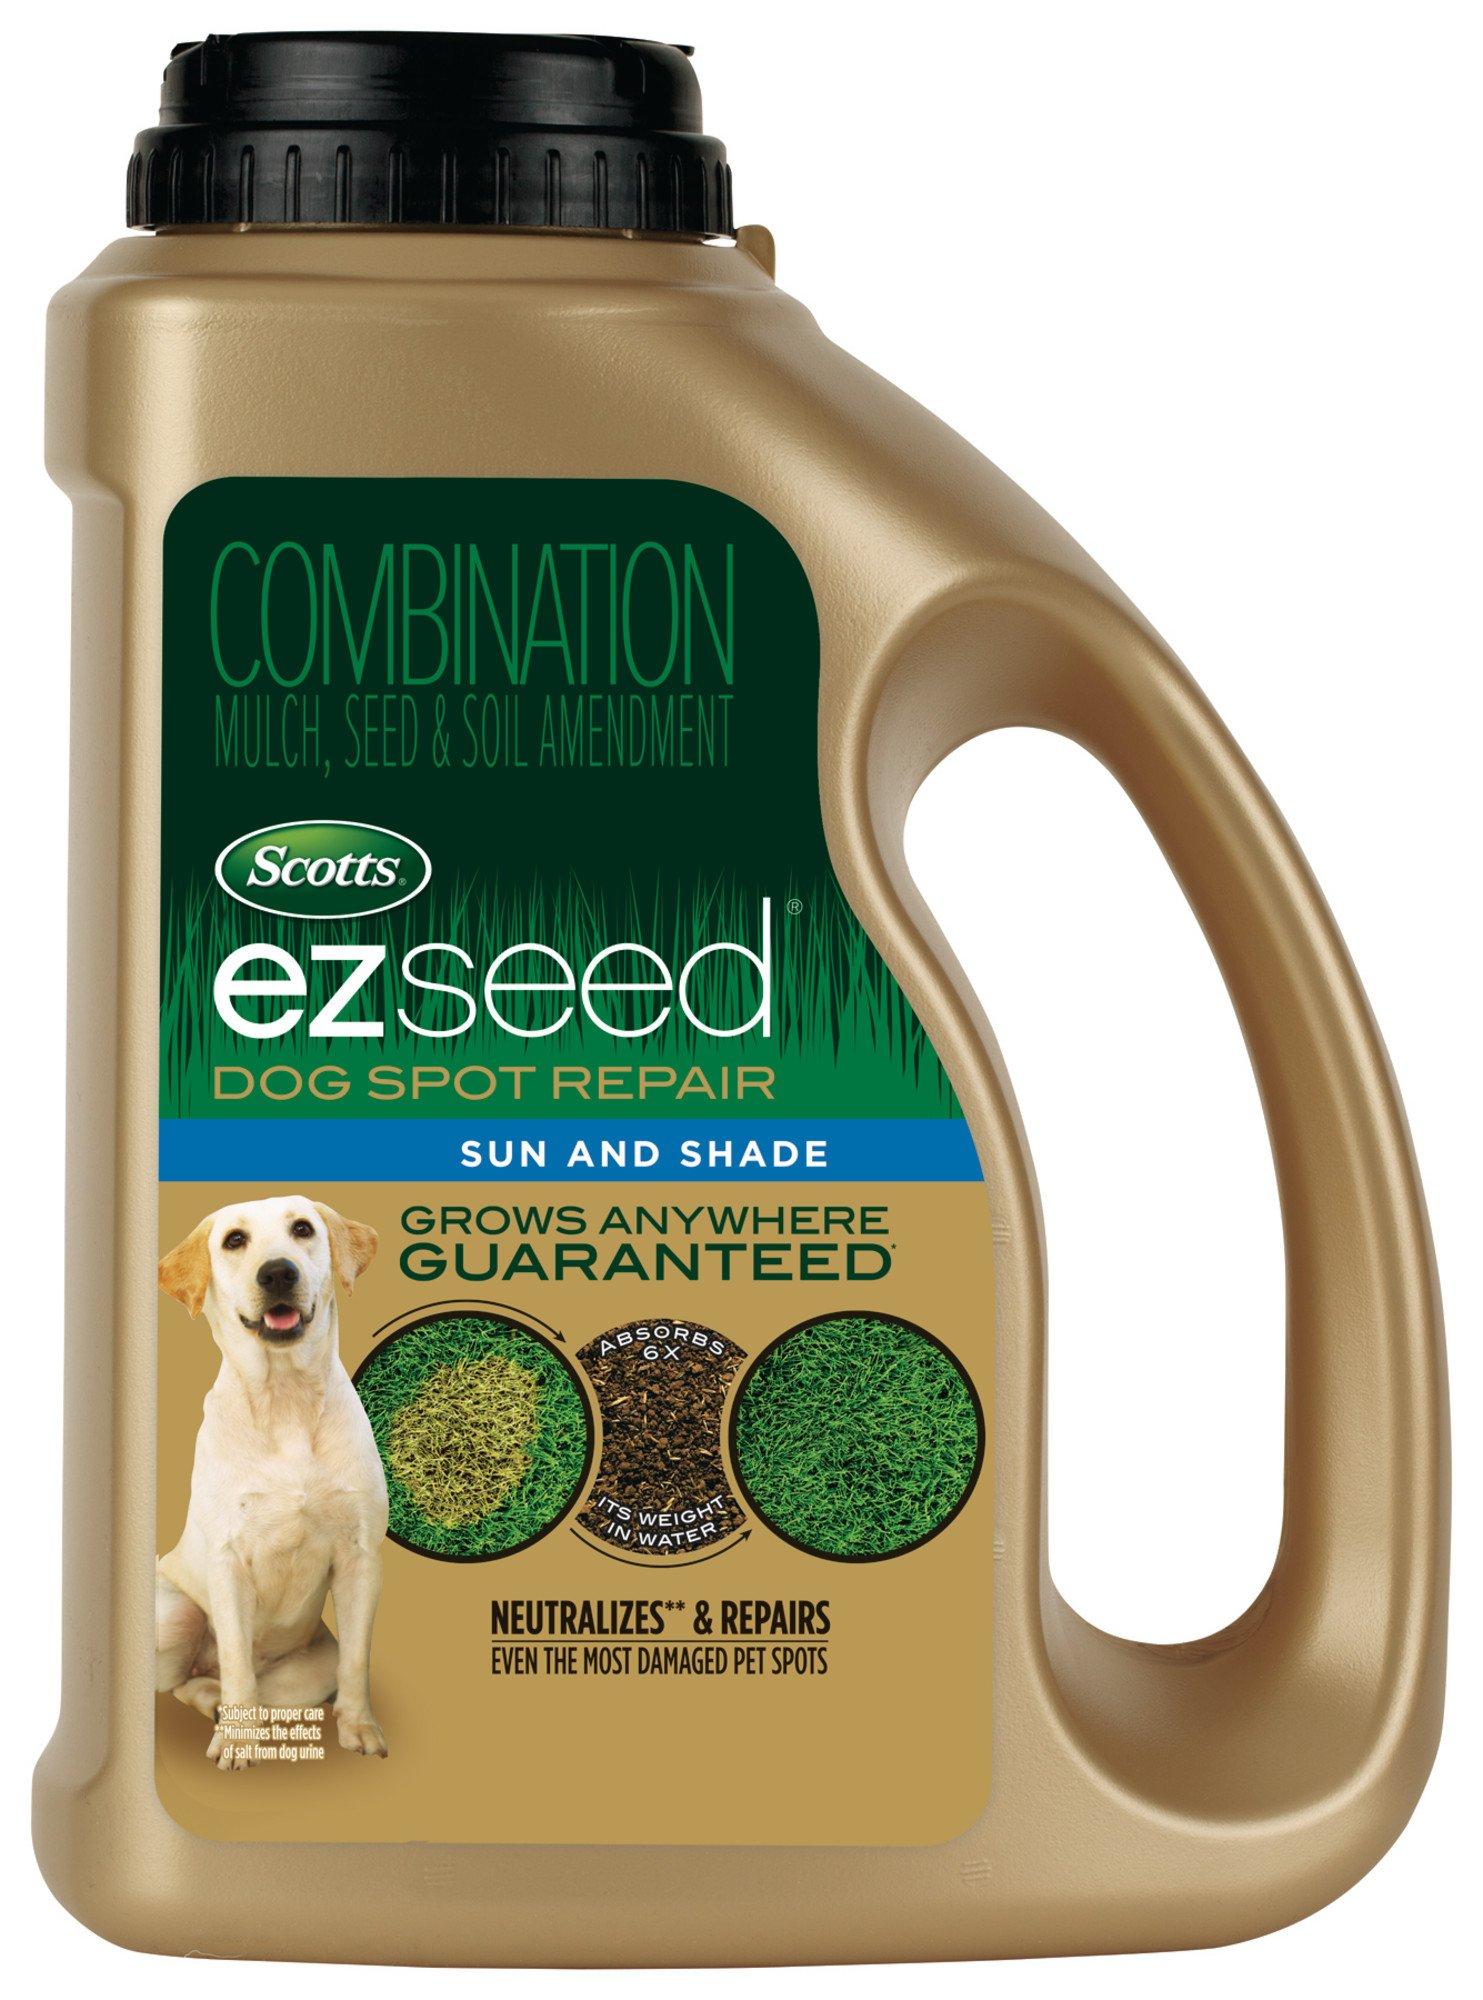 Scotts EZ Seed Sun & Shade 17530 Dog Spot Repair by Scotts